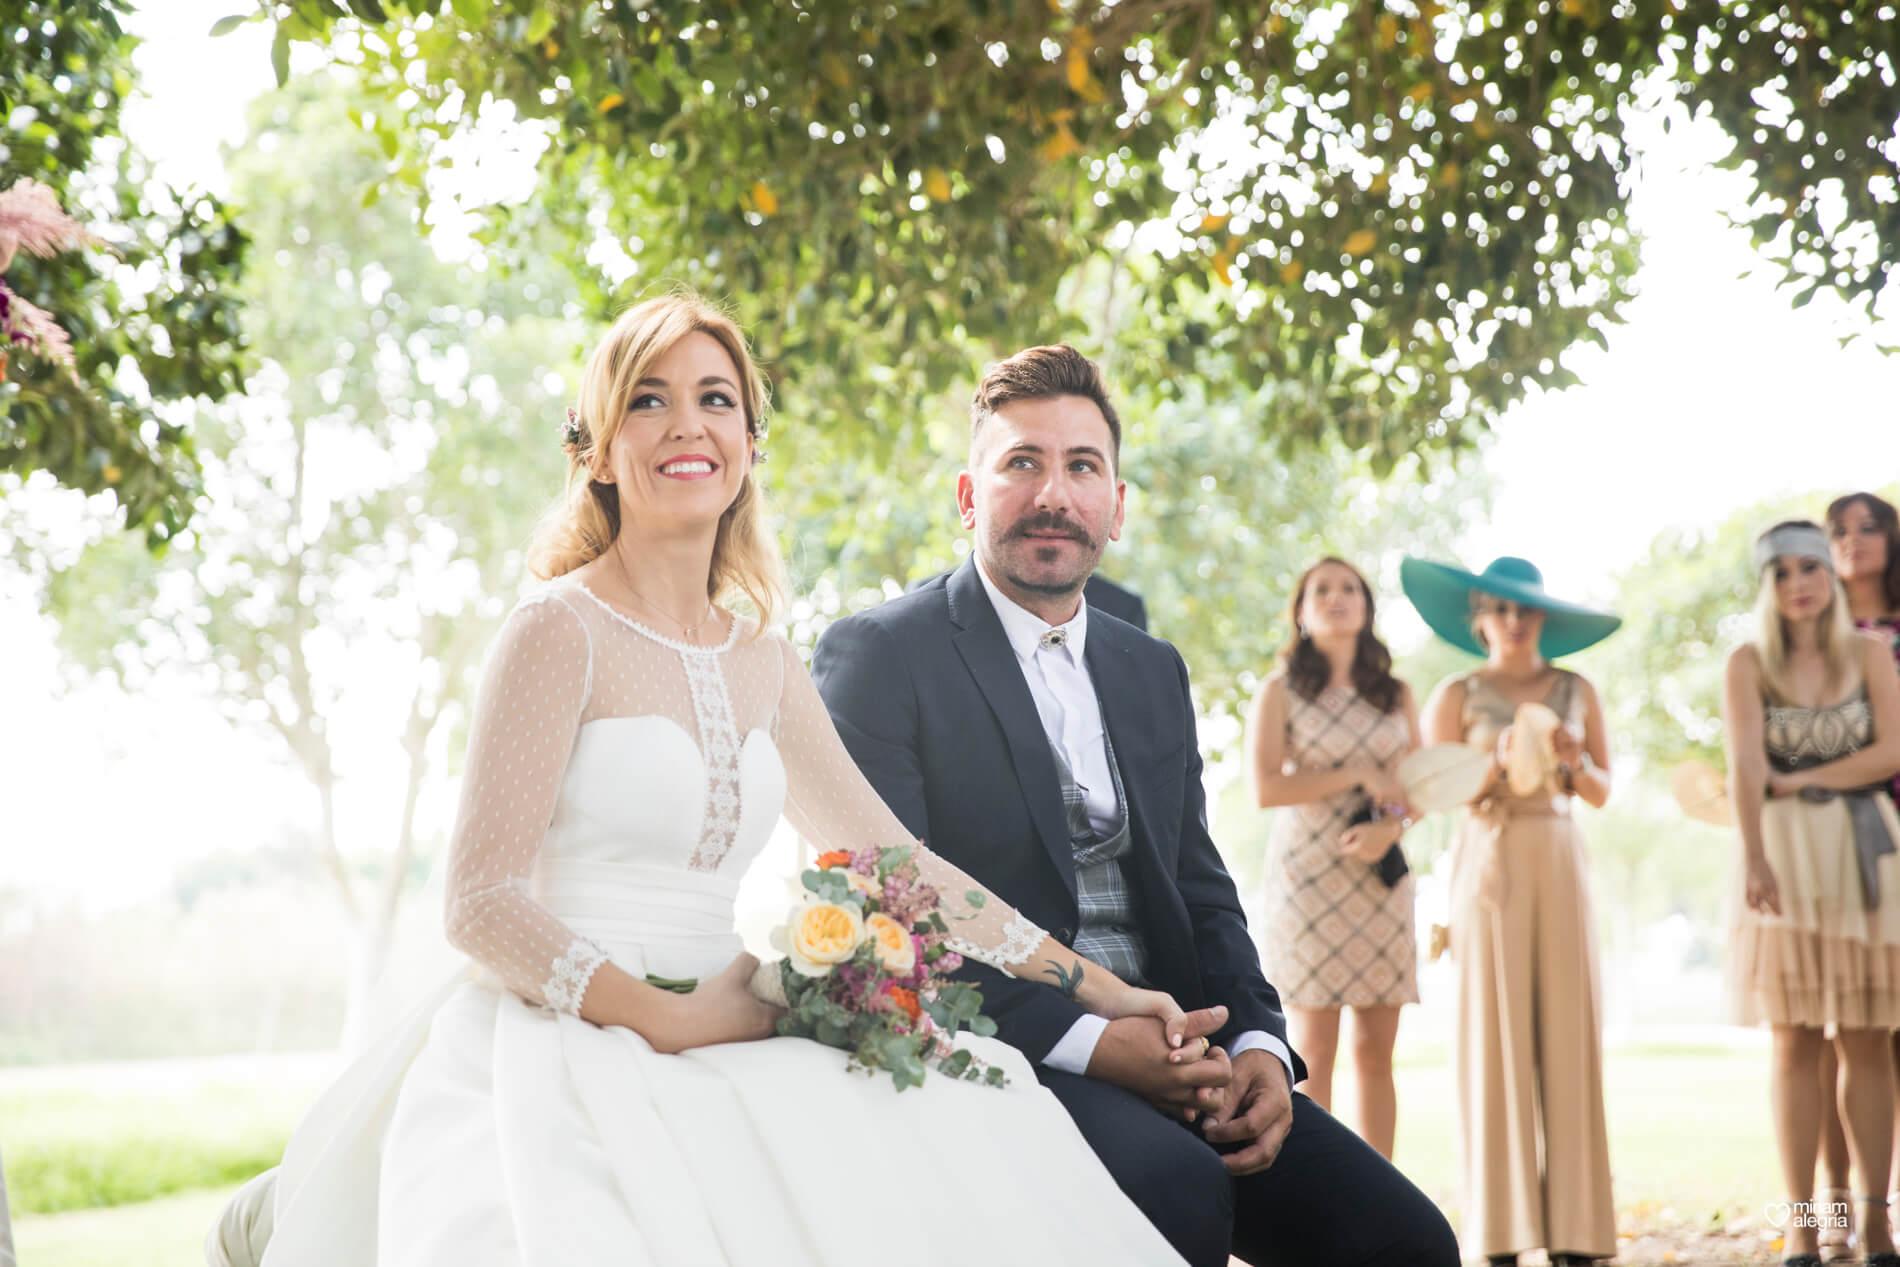 la-boda-de-alemc7-miriam-alegria-fotografos-boda-murcia-48